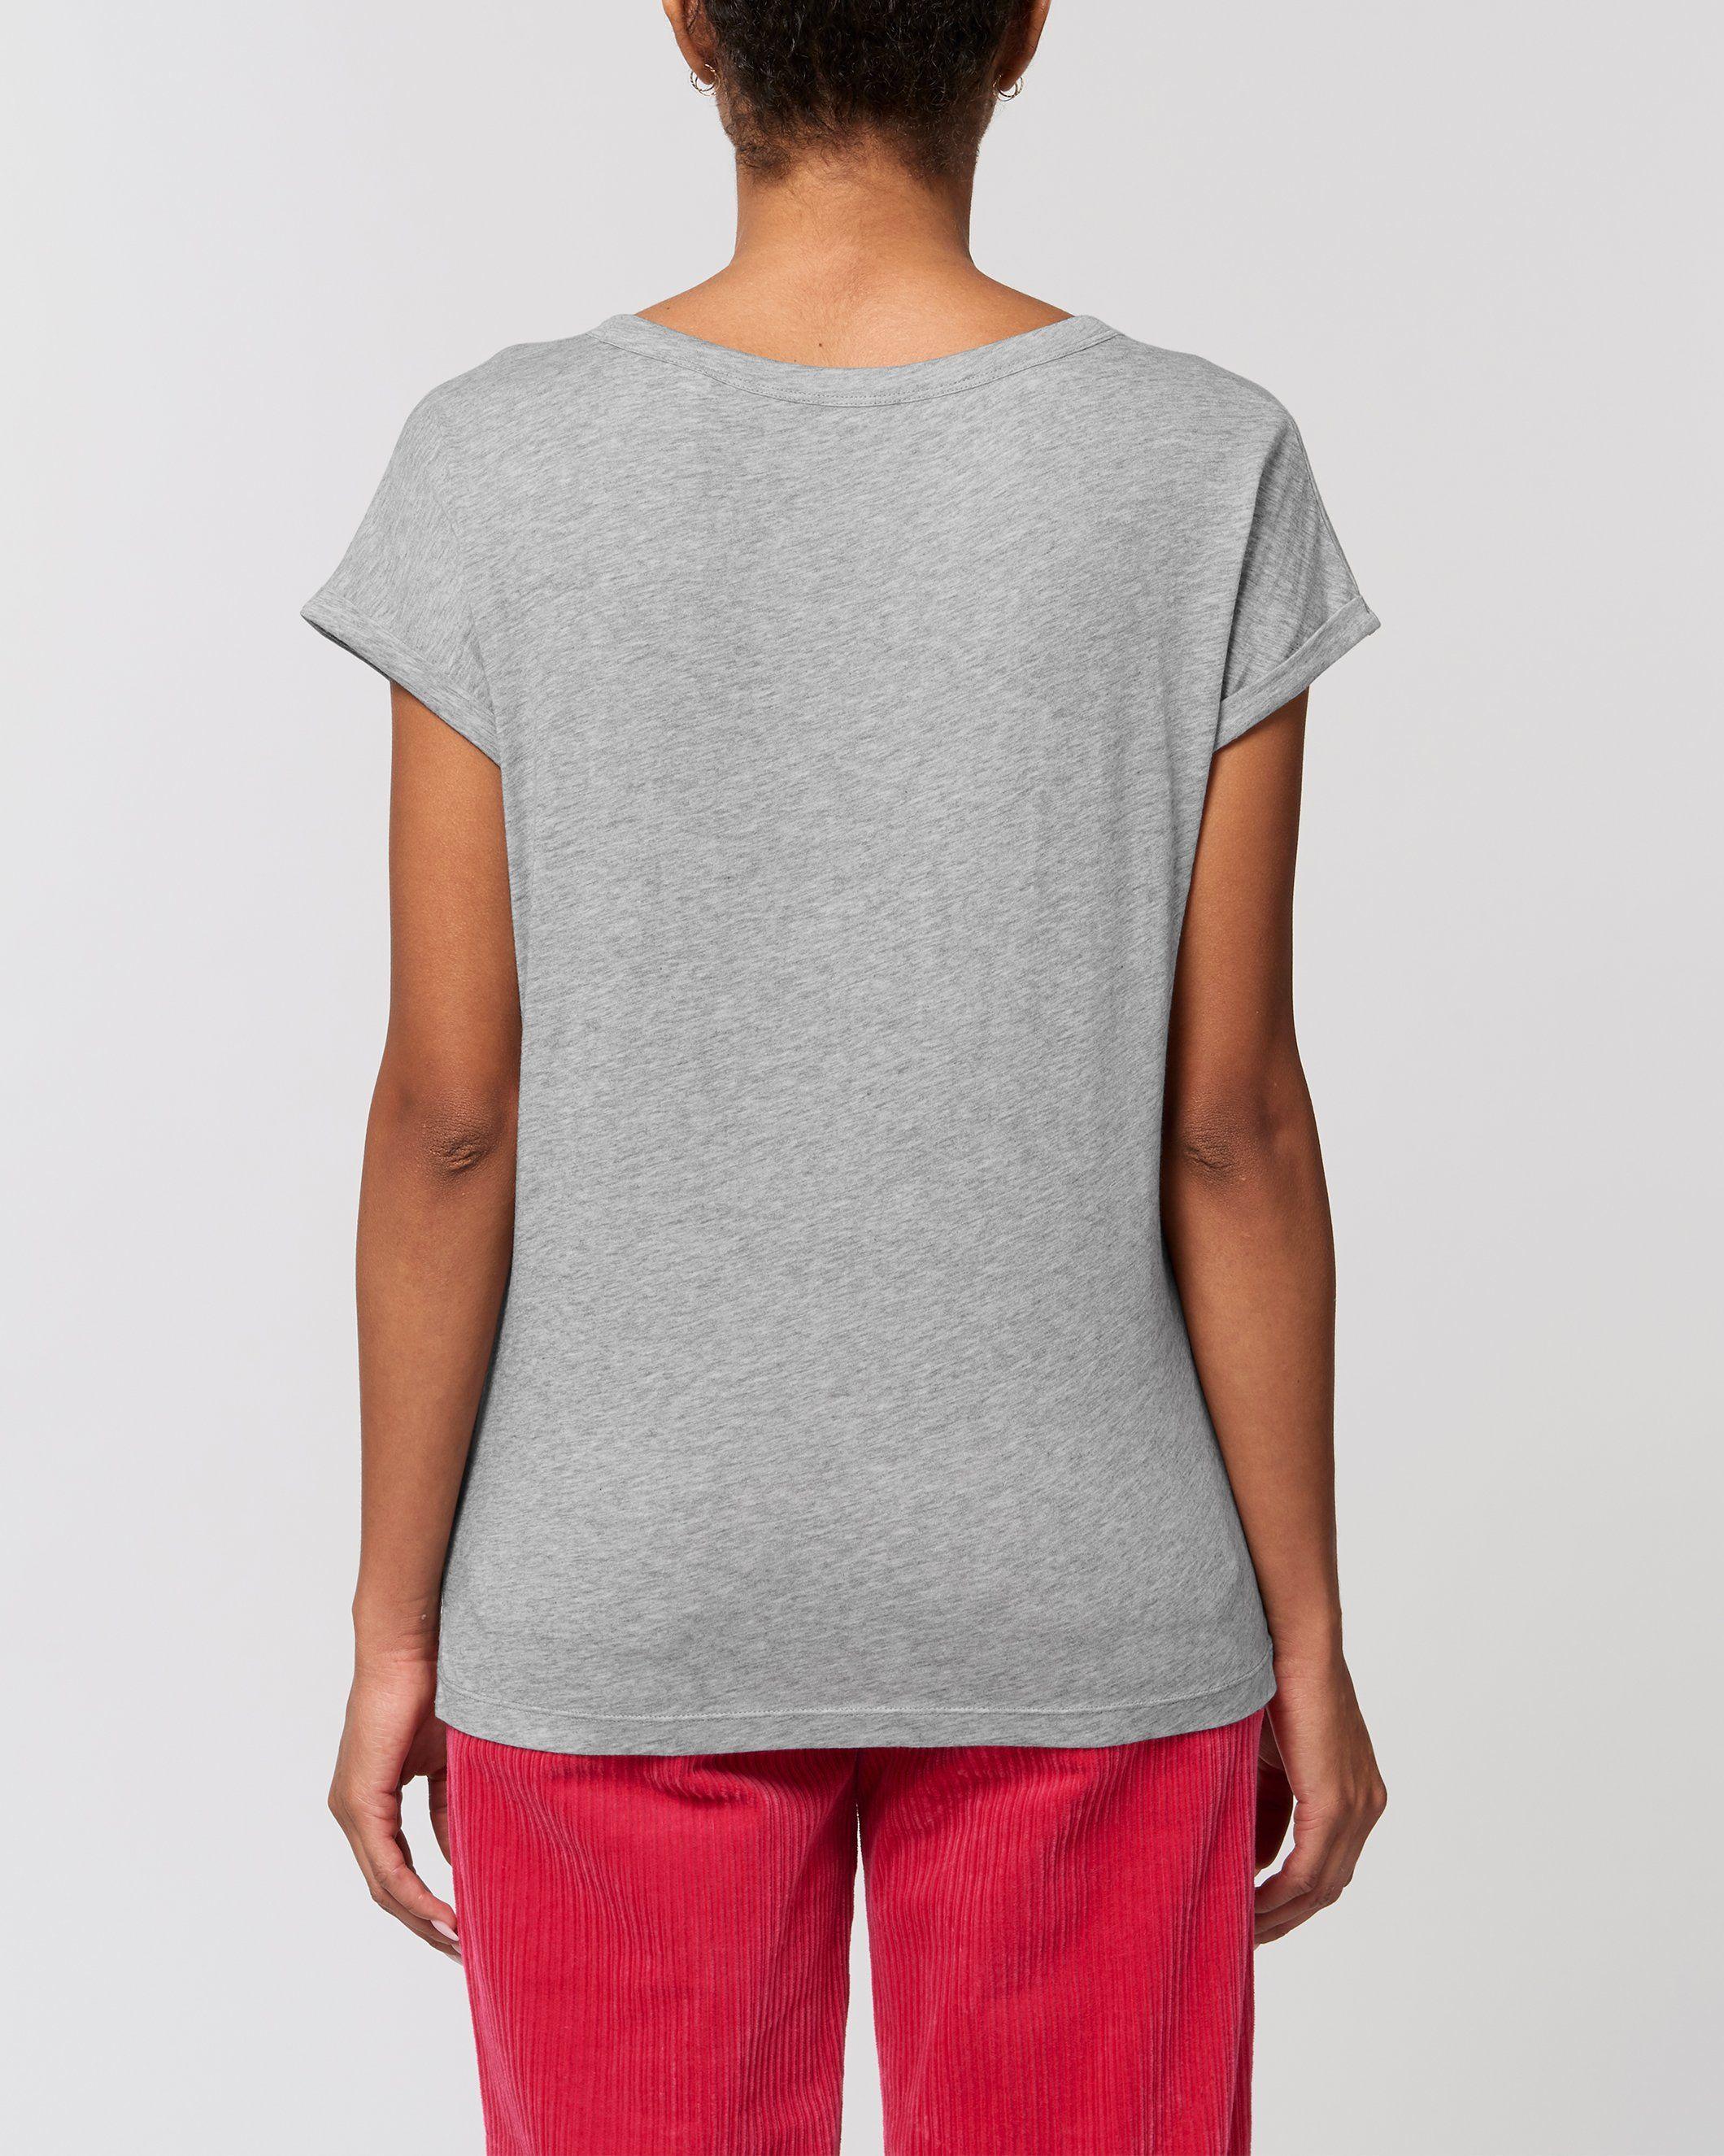 Nadi Women's Rolled Sleeve Slub T-Shirt in Grey